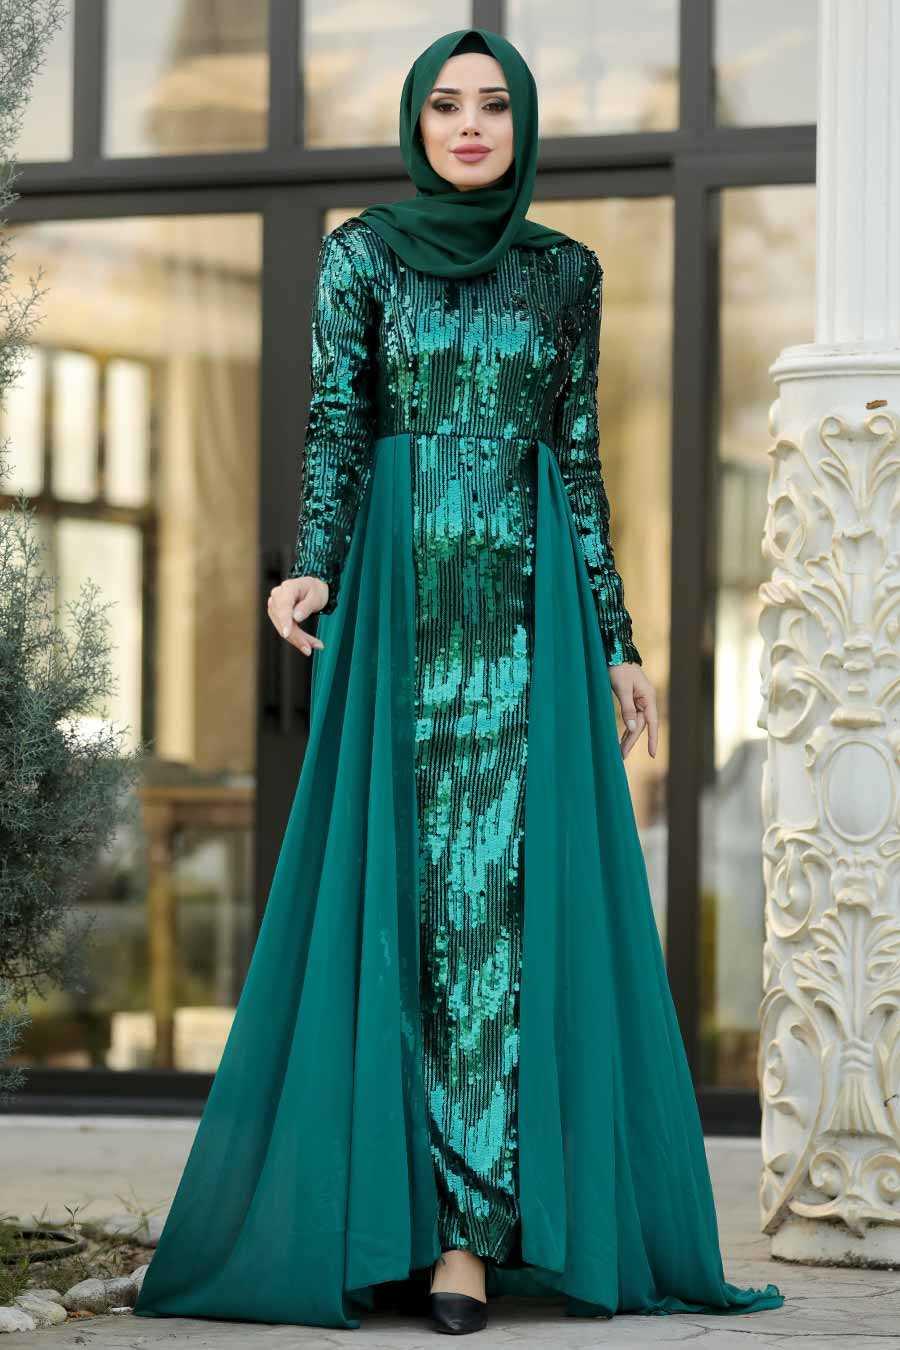 Green Hijab Evening Dress 9111Y